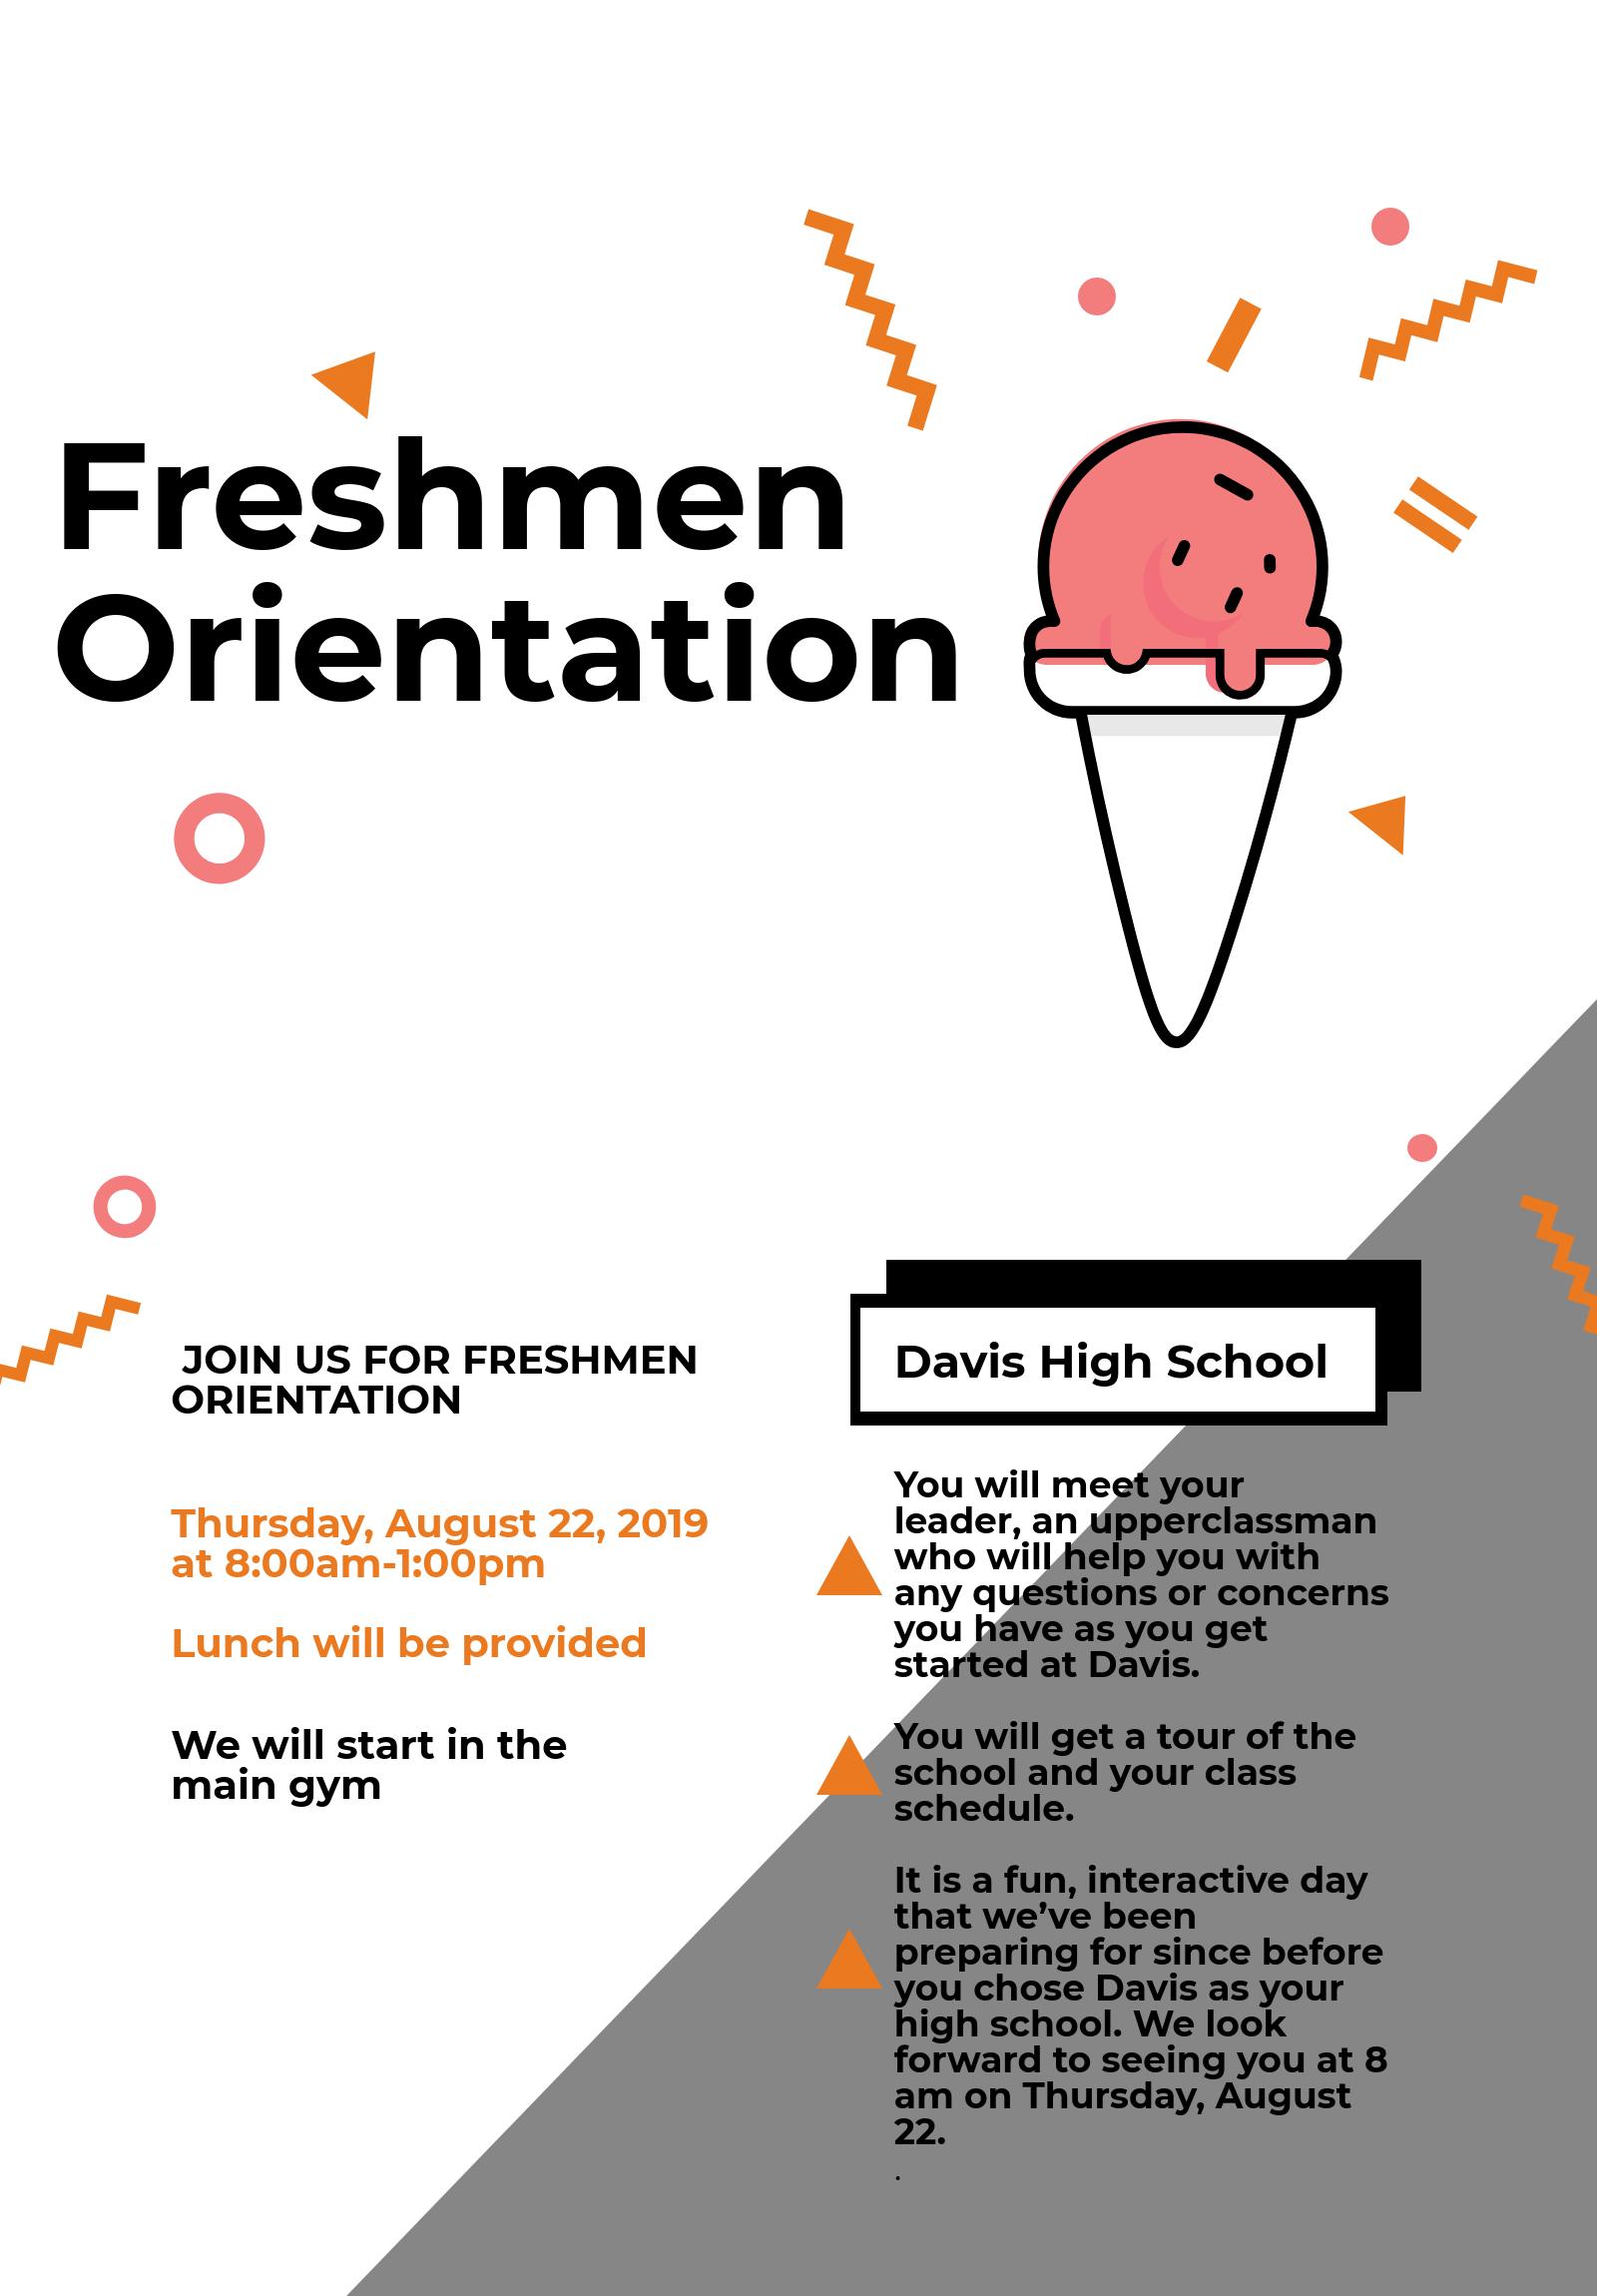 Uc Davis Academic Calendar 2019.Davis High School Homepage